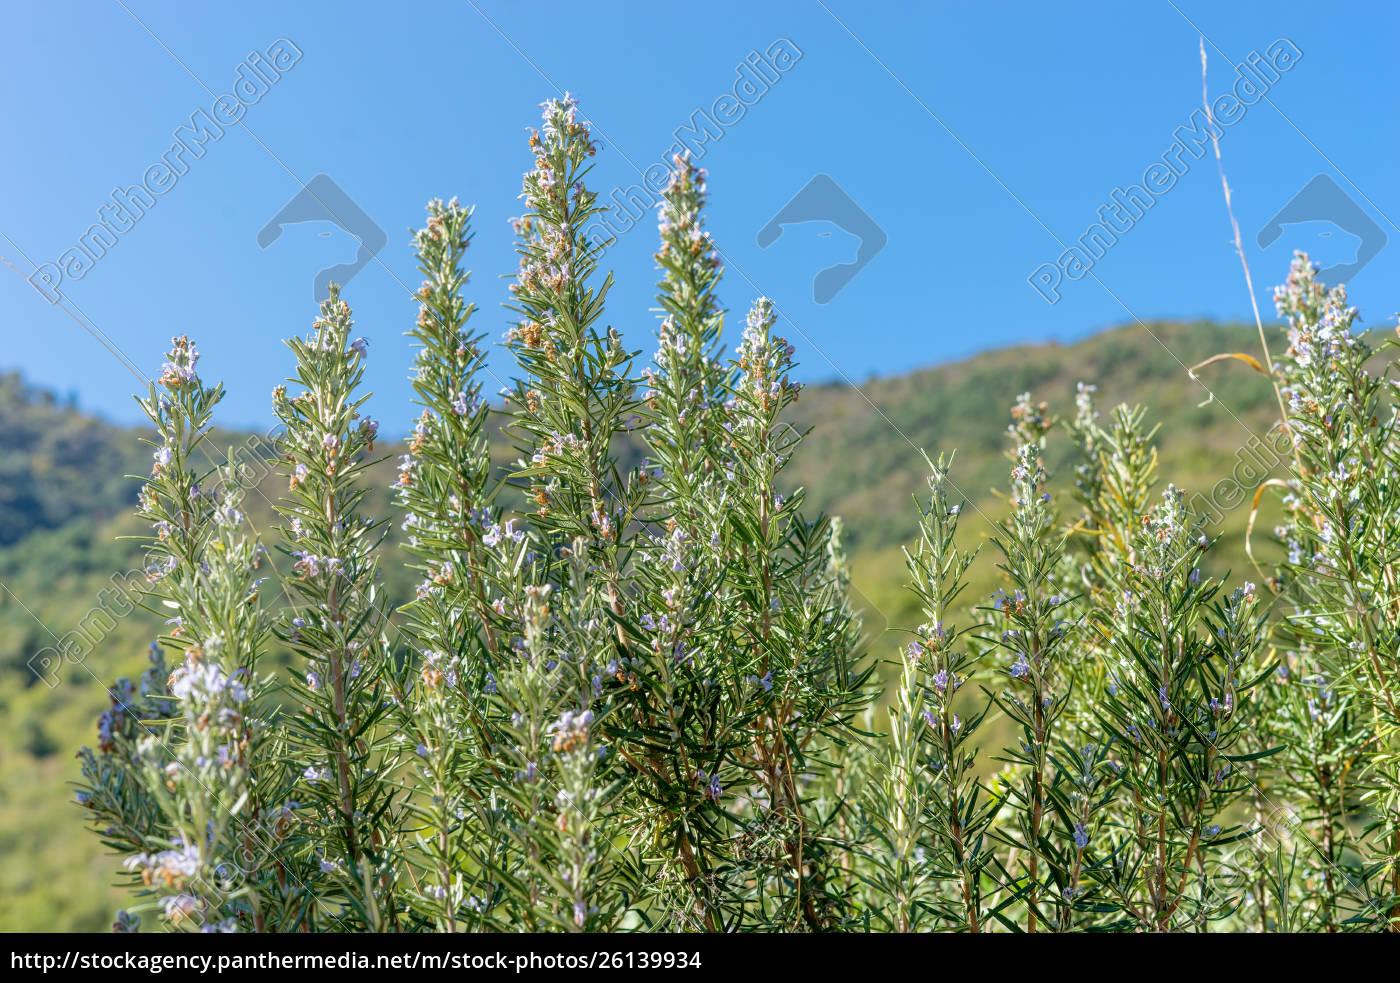 blooming, rosemary, bushes - 26139934